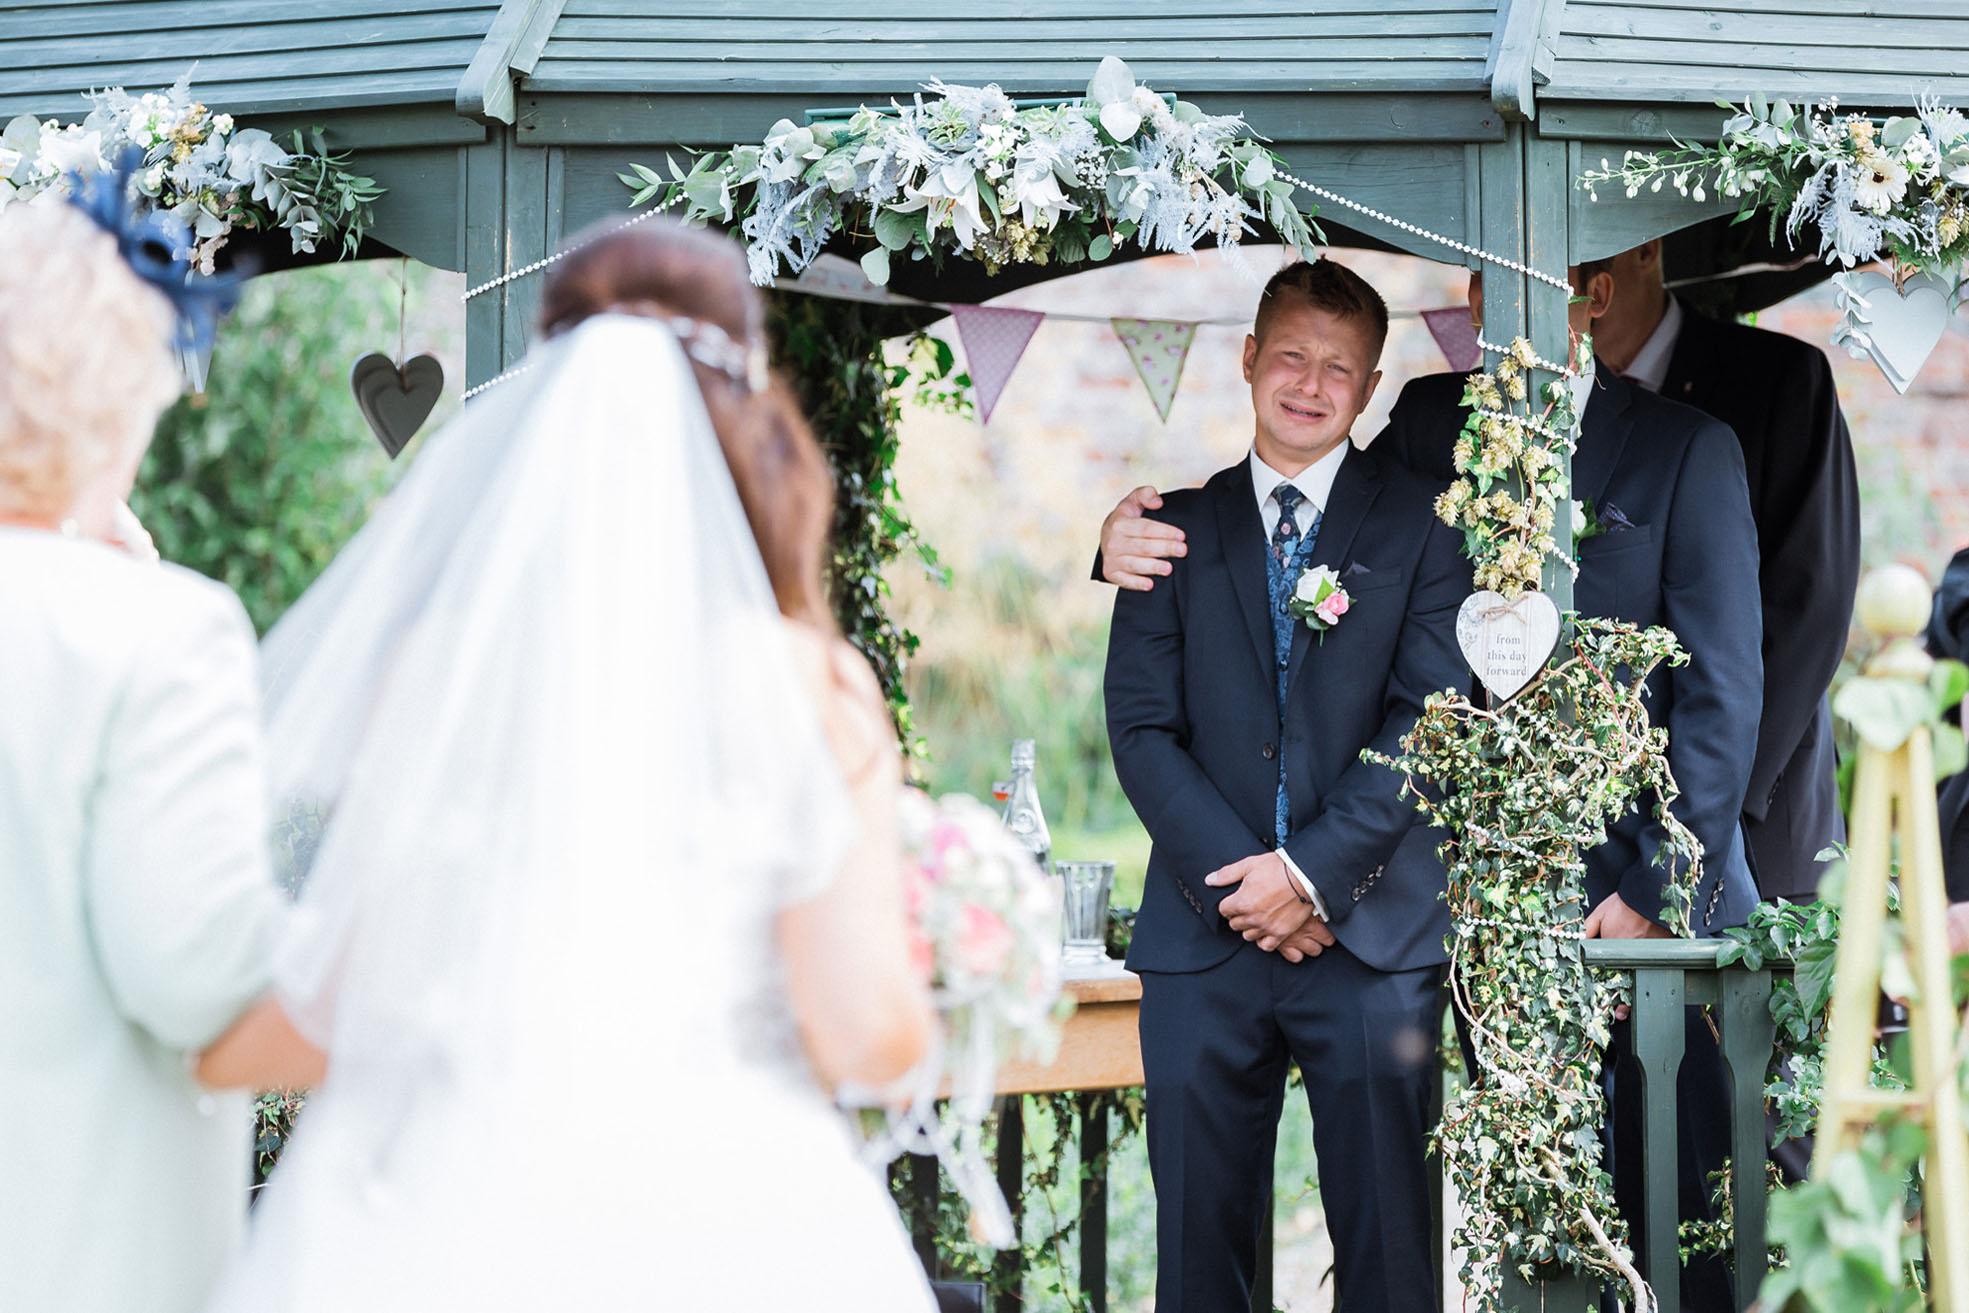 Kent - Wedding – The Secret Garden – Michelle & Sam – The First Look